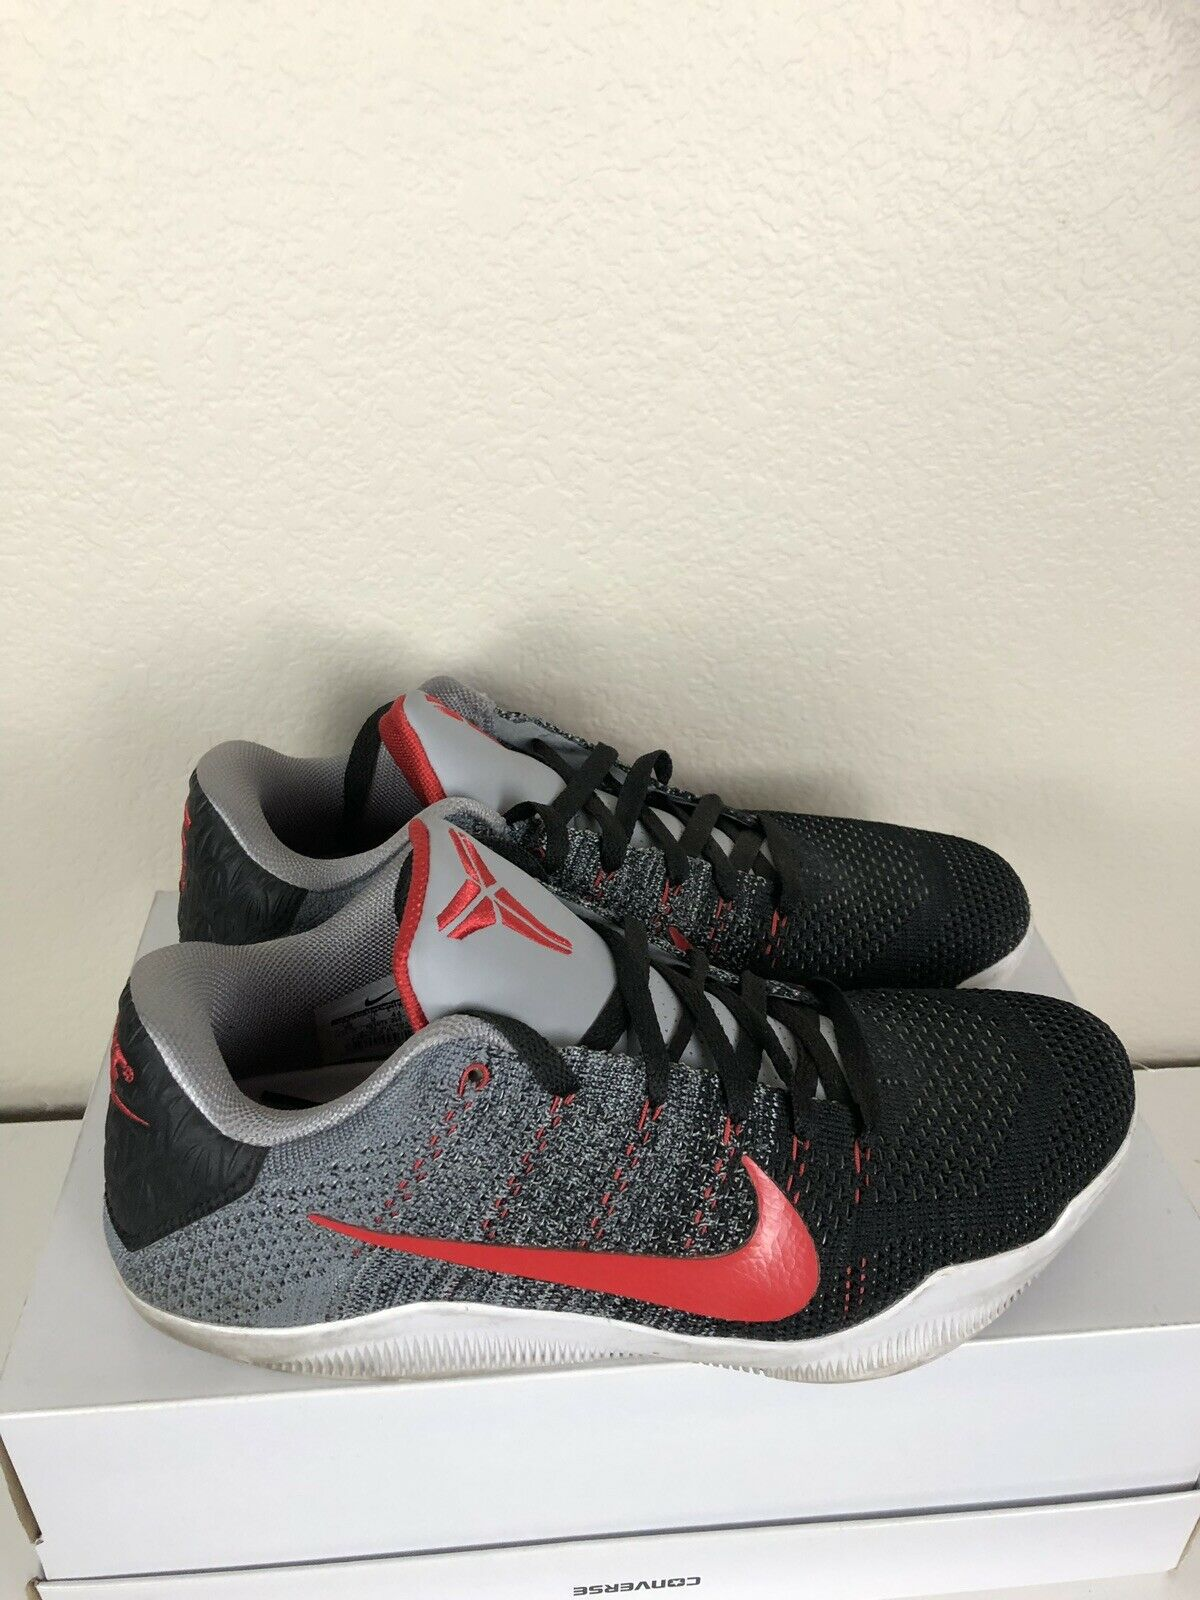 Nike Kobe Bryant Elite Low Muse Tinker Hatfield 10